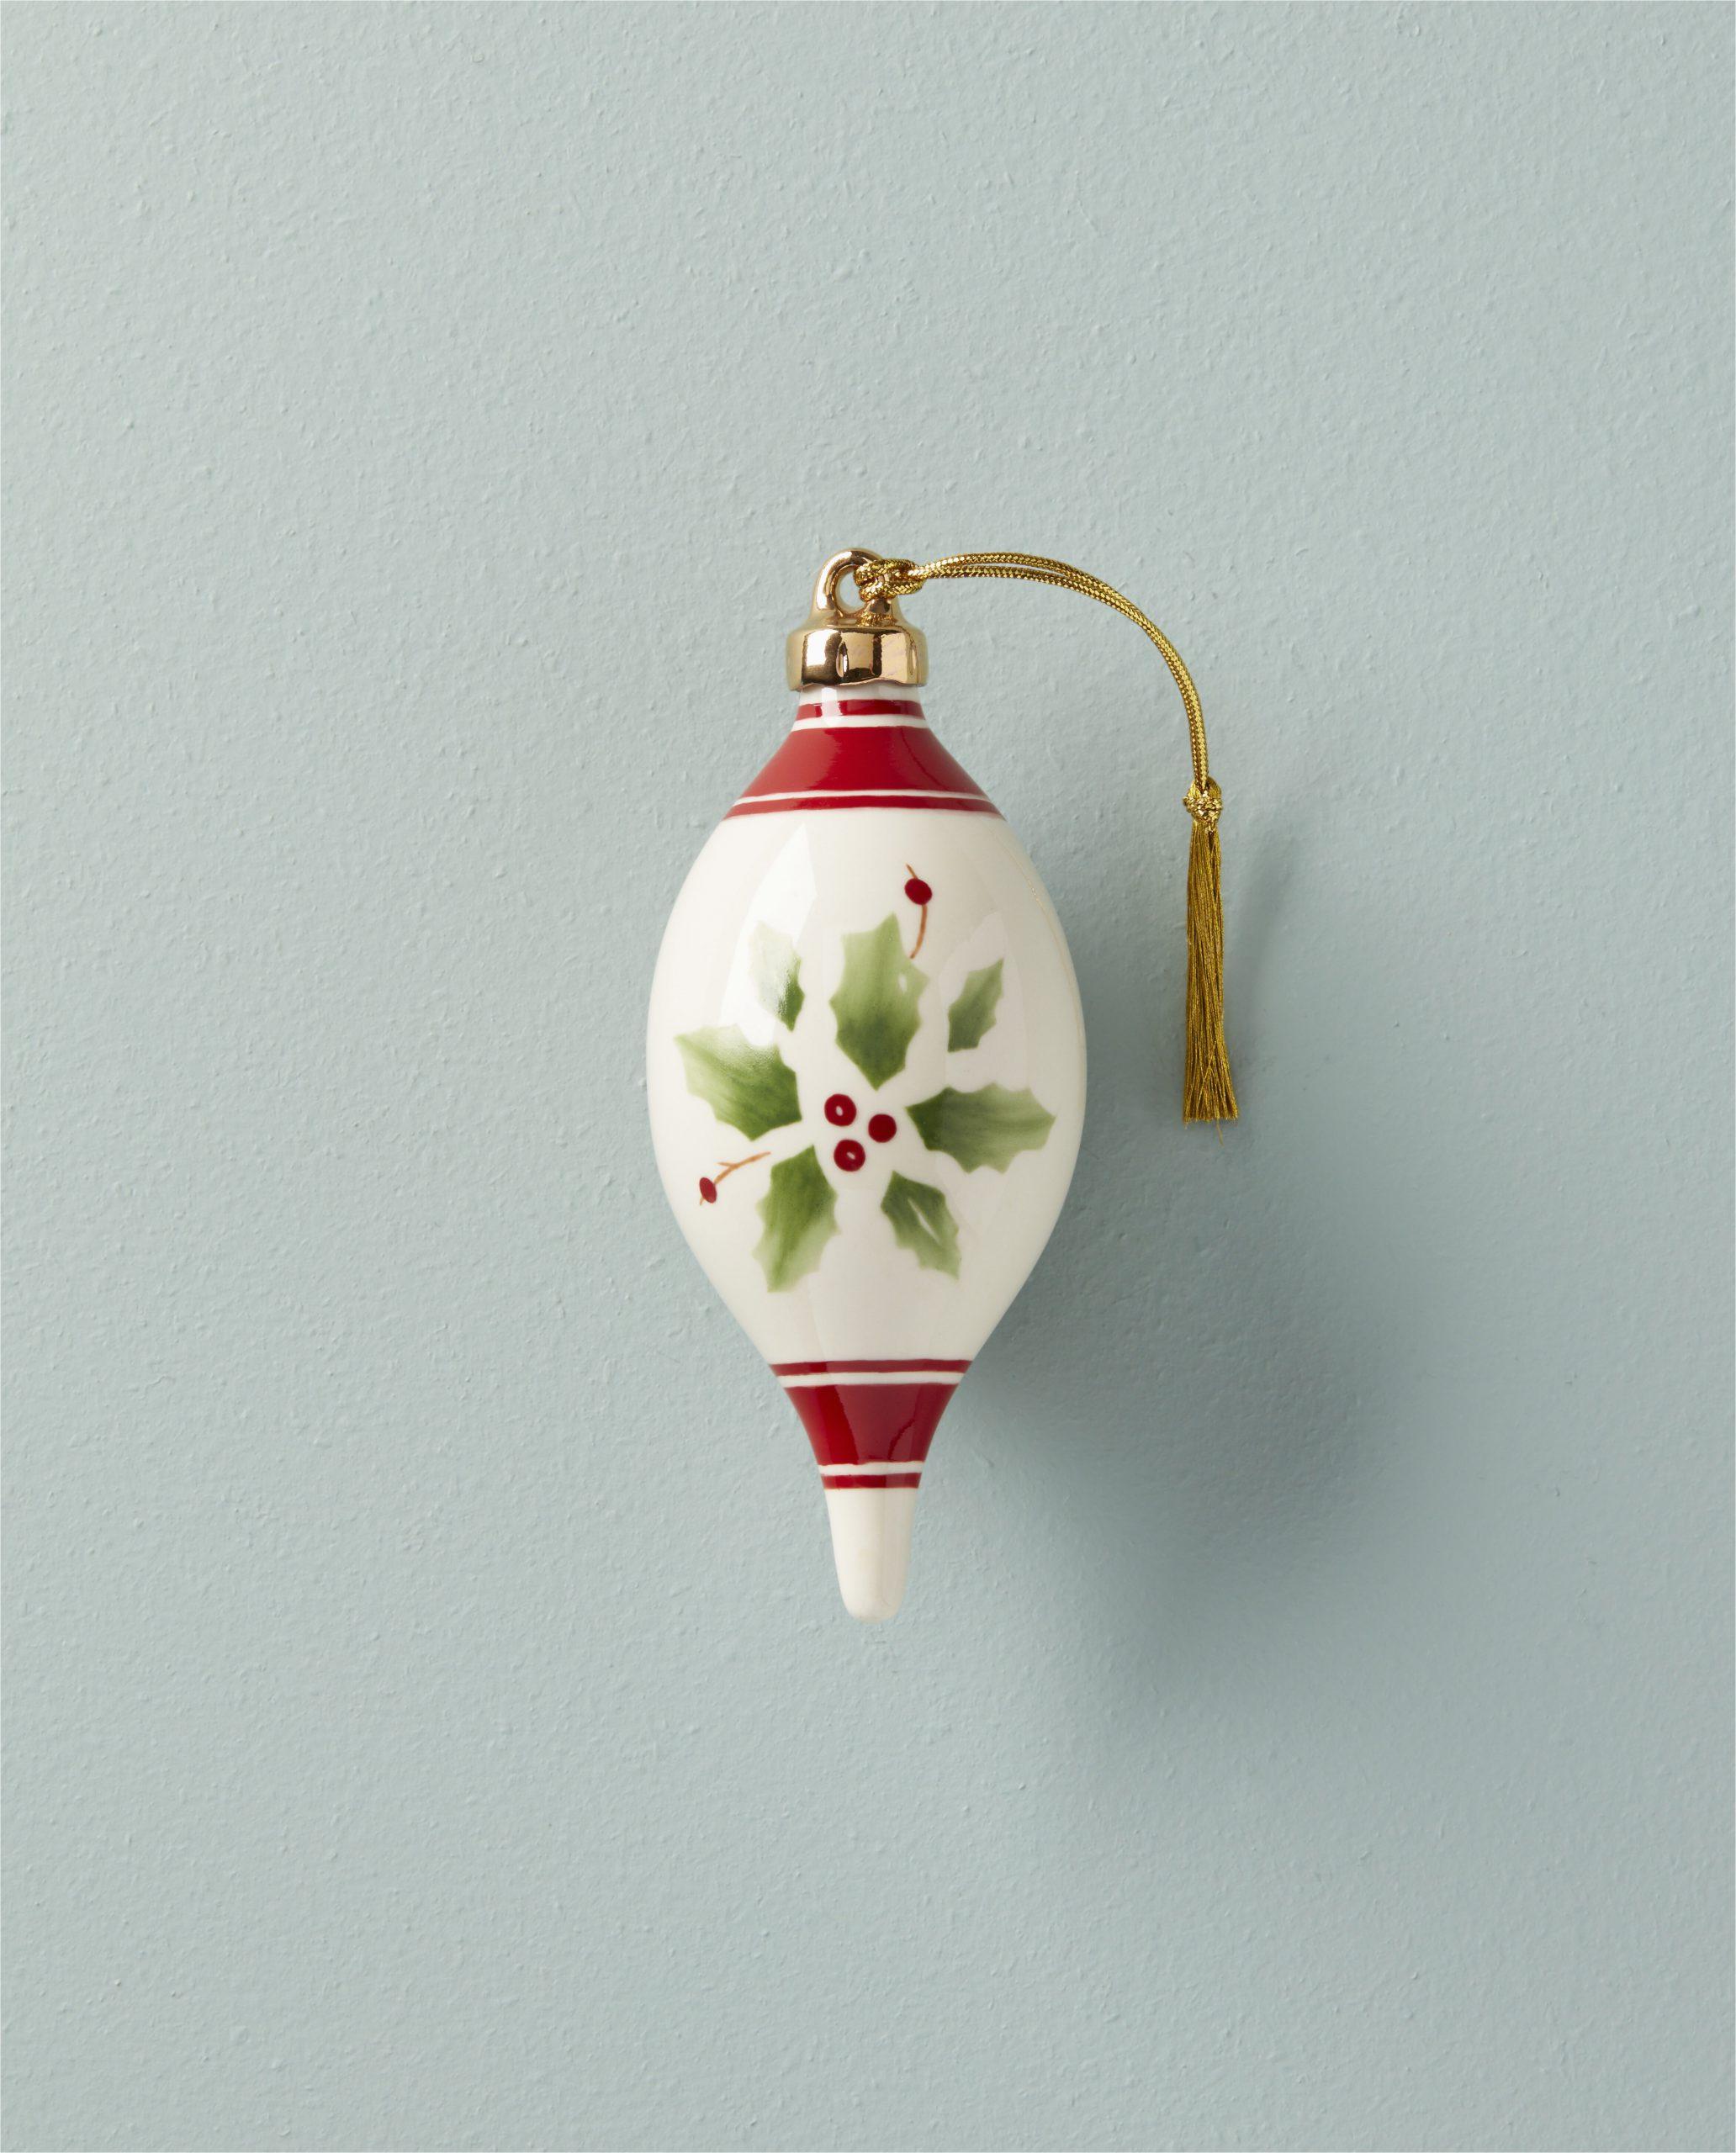 Lenox Holiday Bath Rug Holiday Hand Paint Stripe Spire Finial ornament